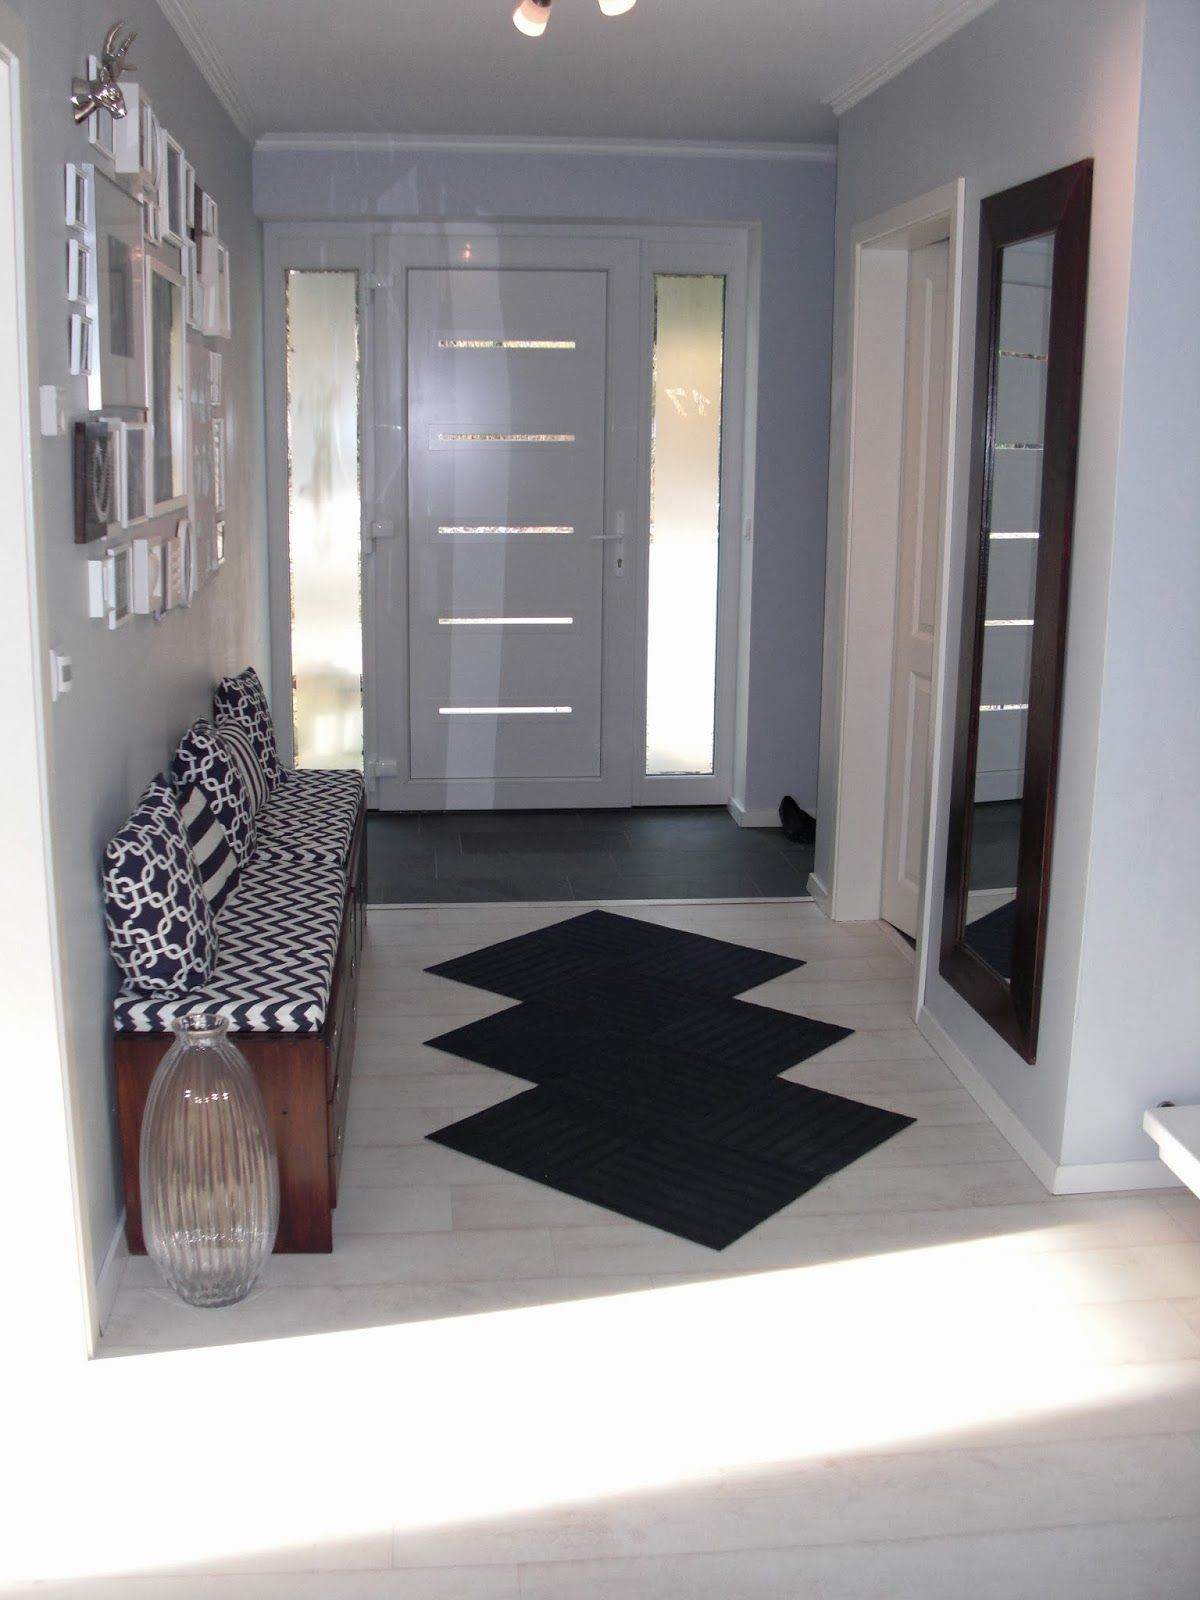 dyi flur teppich f r 7 00 flur eingangsbereich garderoben treppenhaus pinterest flure. Black Bedroom Furniture Sets. Home Design Ideas